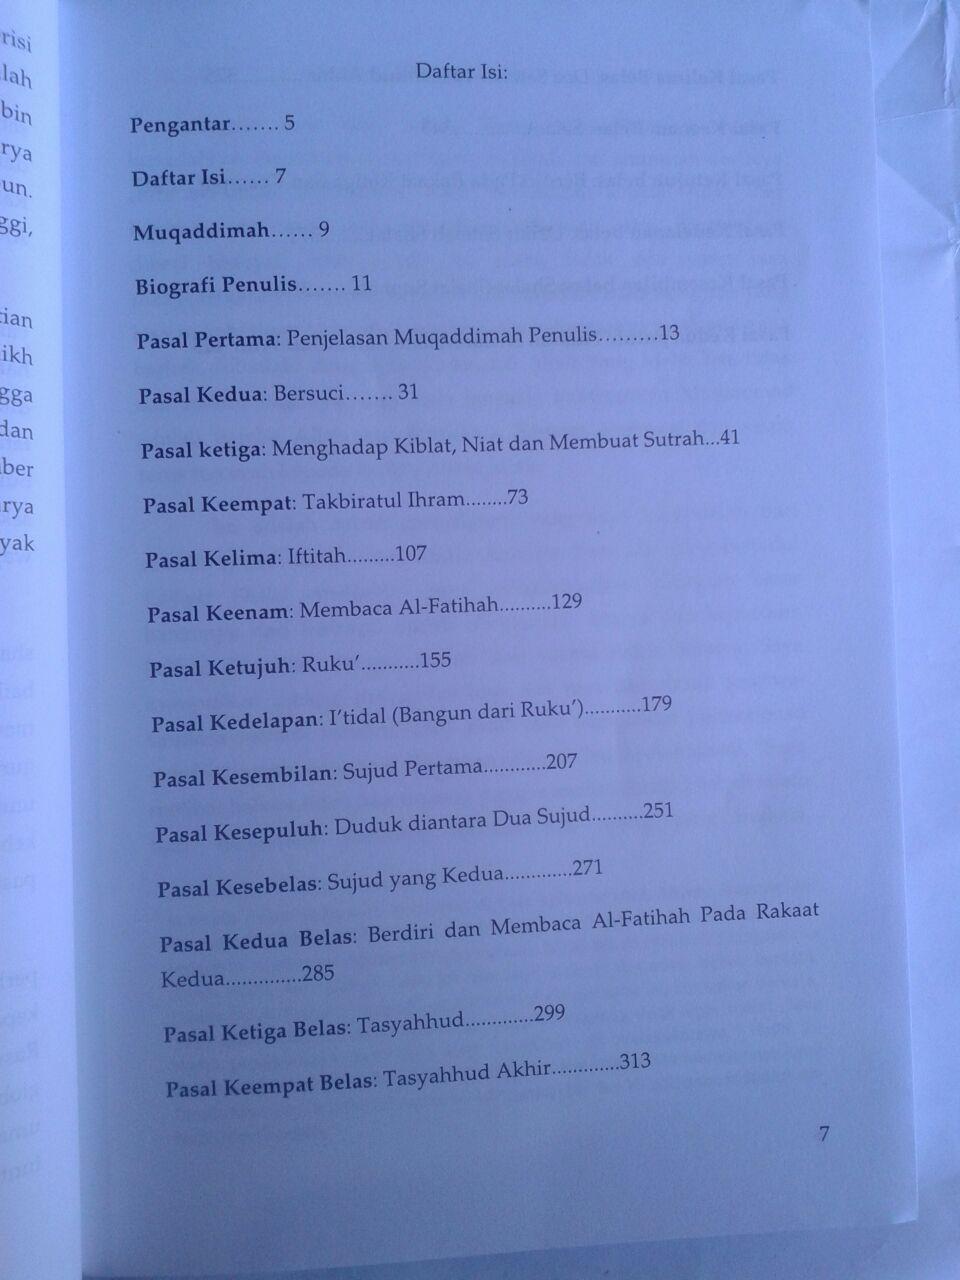 Buku Syarah Kaifiyat Penjelasan Tata Cara Shalat Nabi Syaikh Bin Baz isi 3